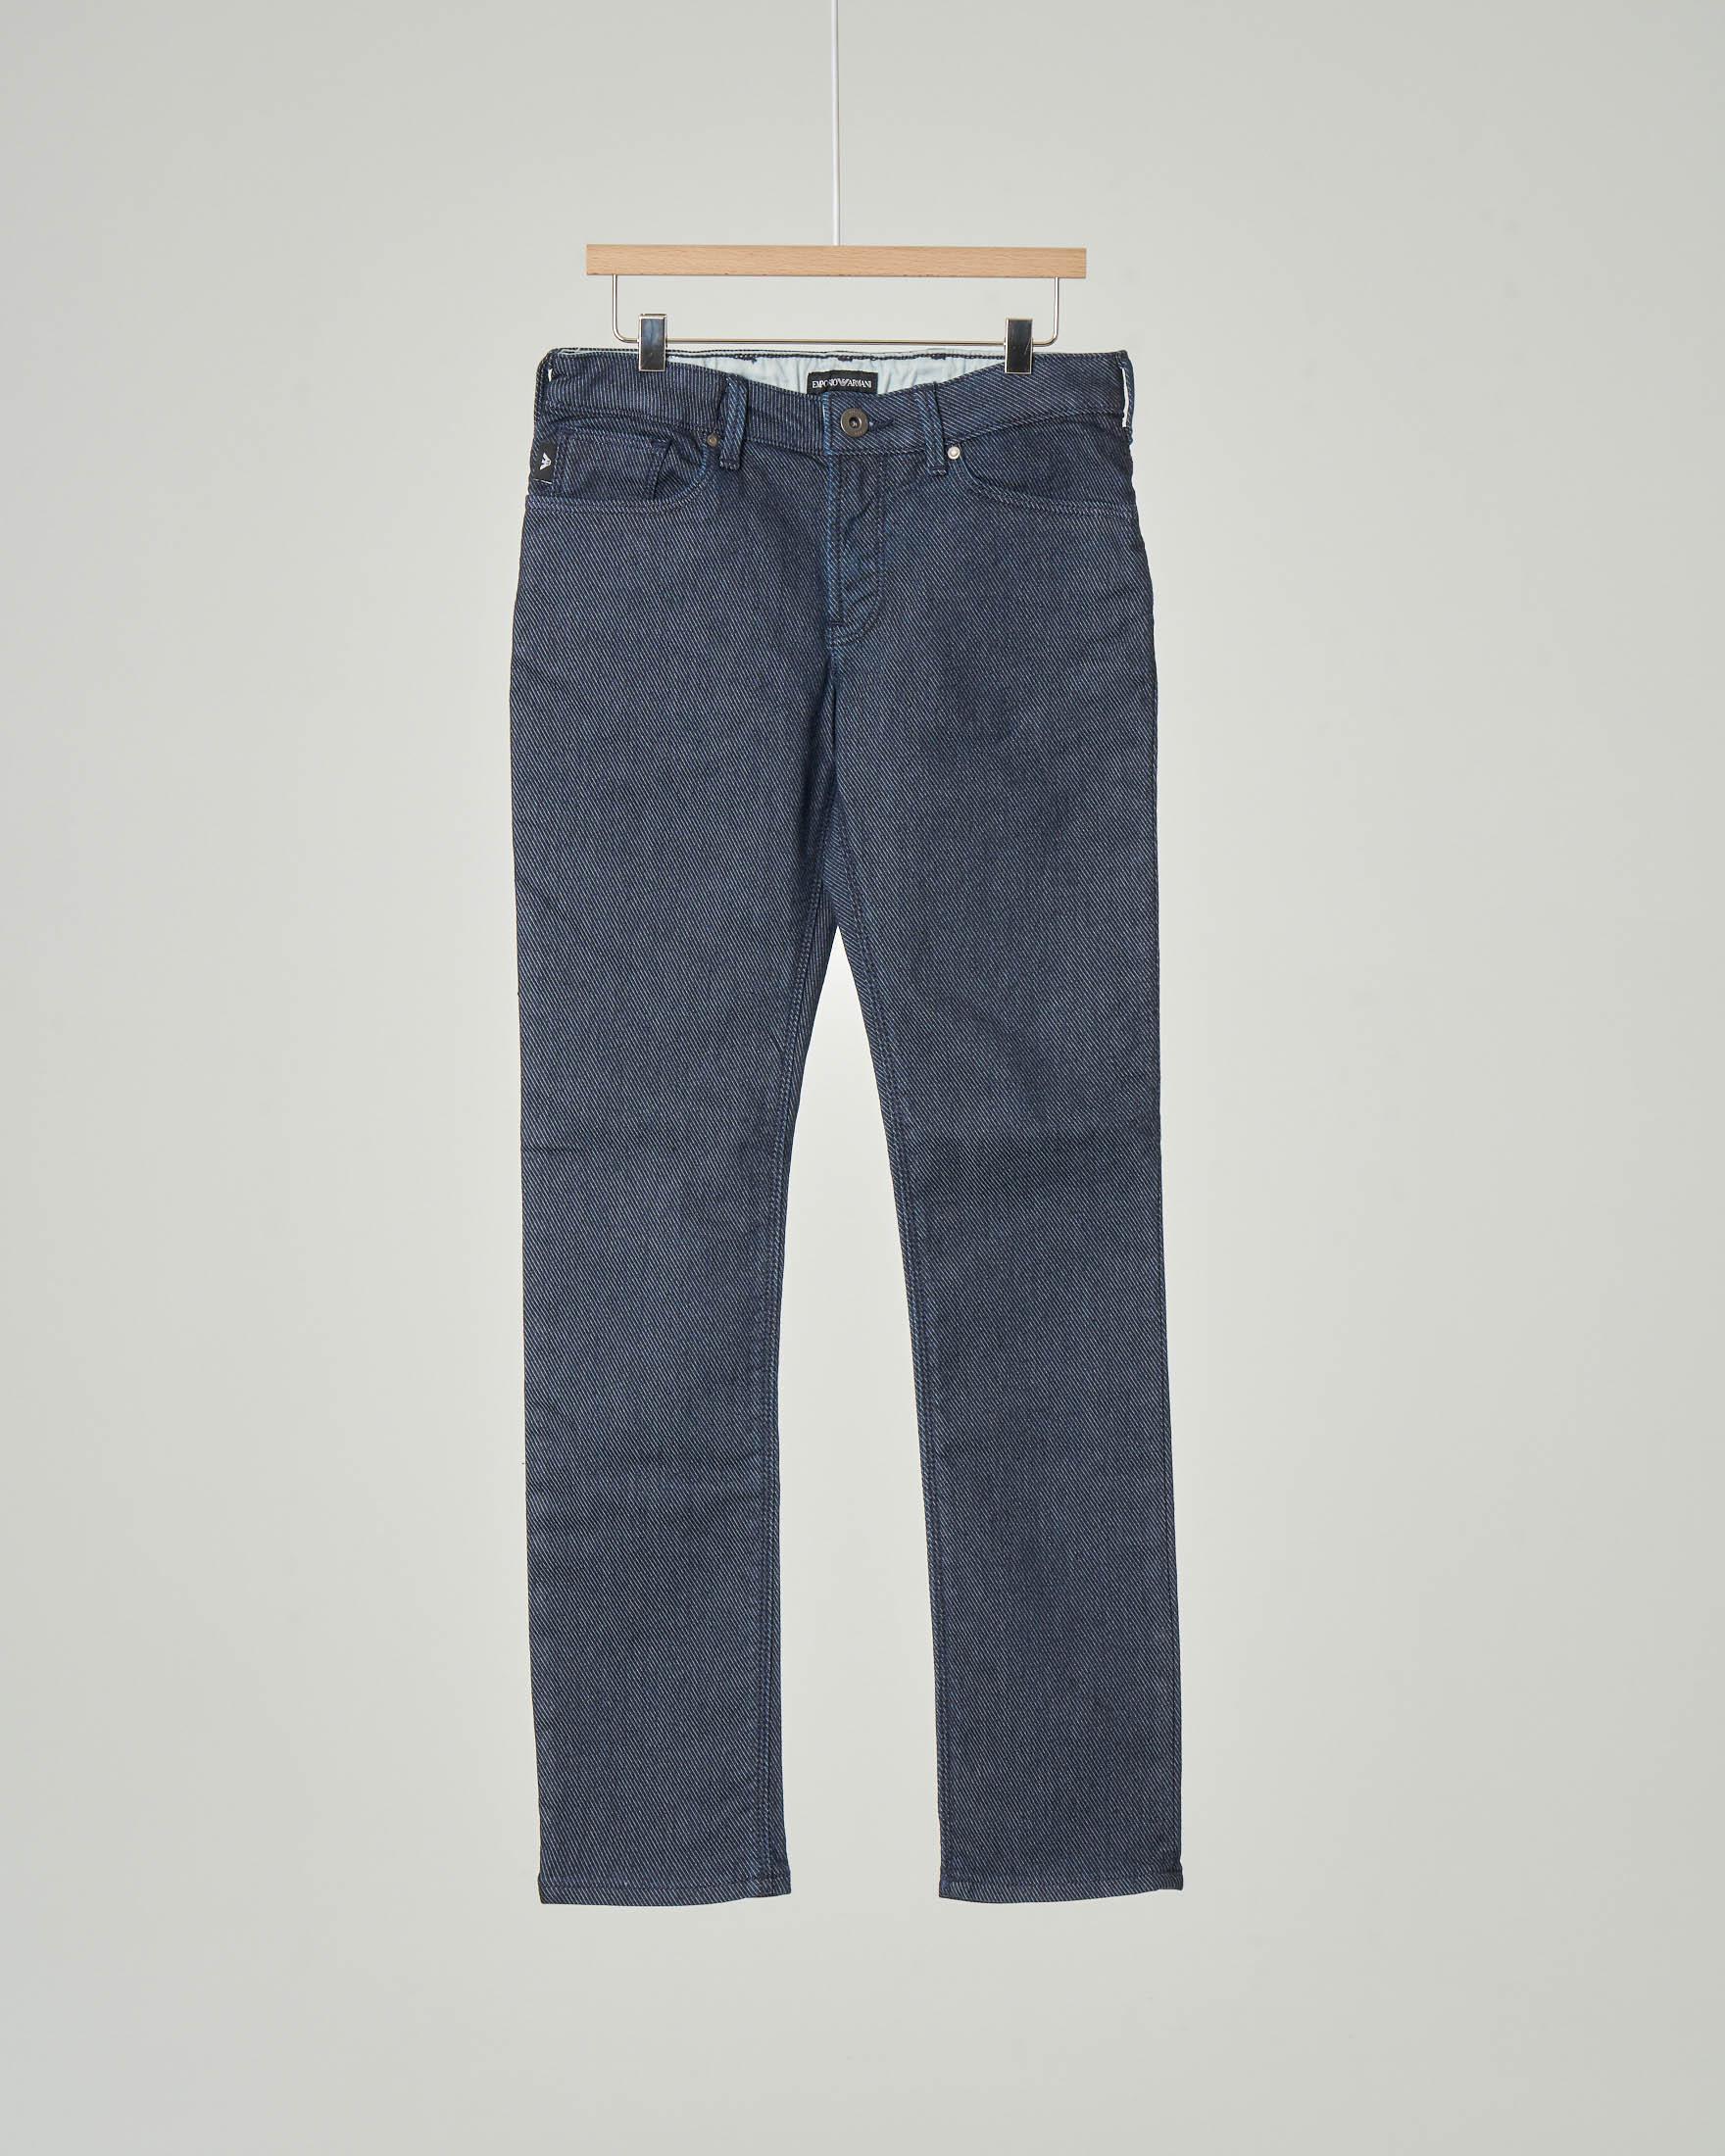 Pantalone cinque tasche blu in tessuto effetto denim 10-16 anni